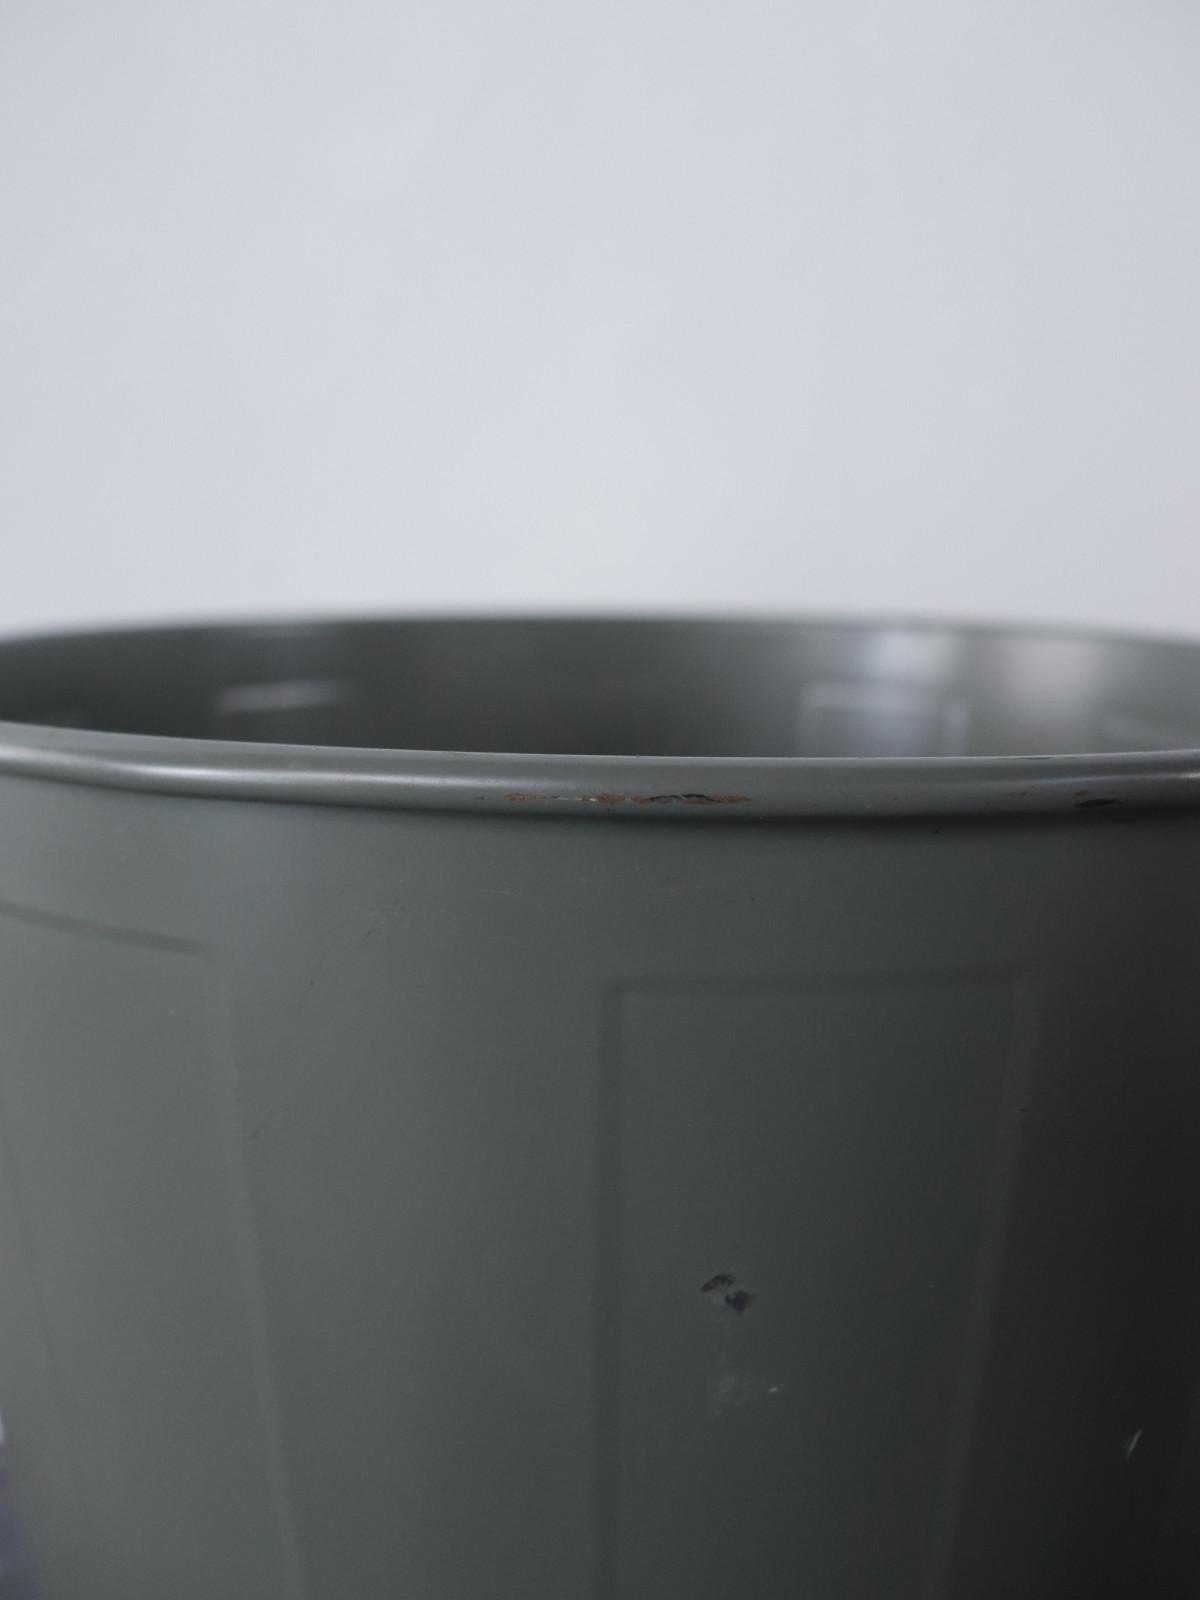 metal,trush can,USA